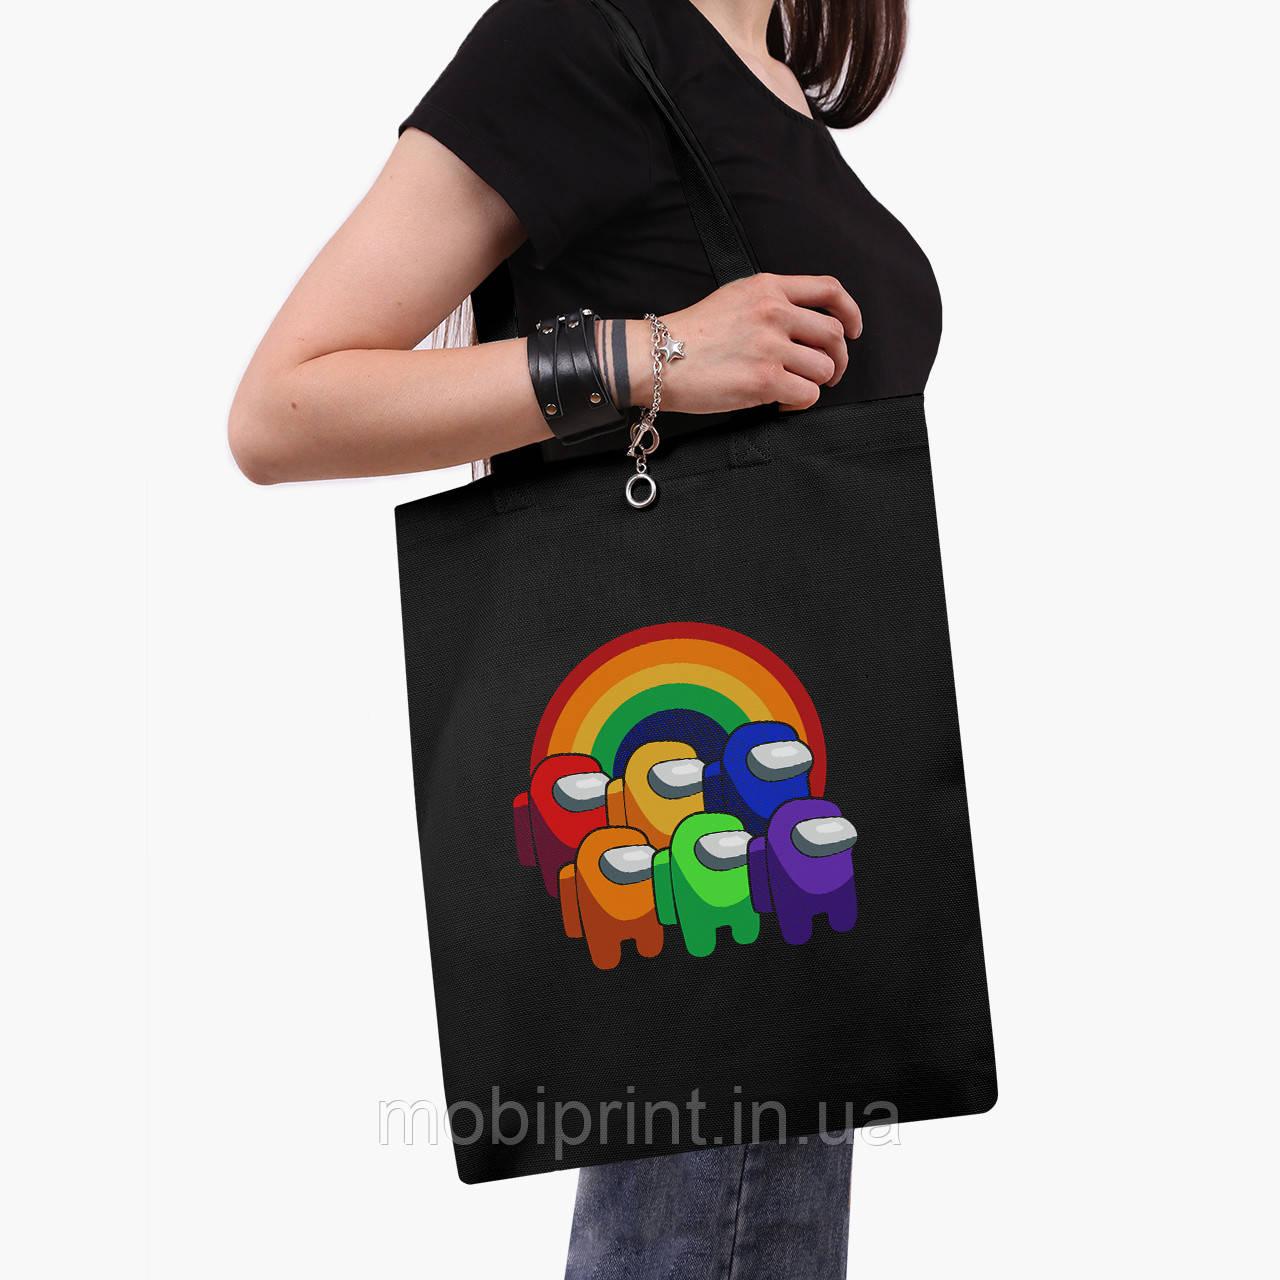 Еко сумка шоппер чорна Амонг Ас (Among Us) (9227-2595-2) 41*35 см